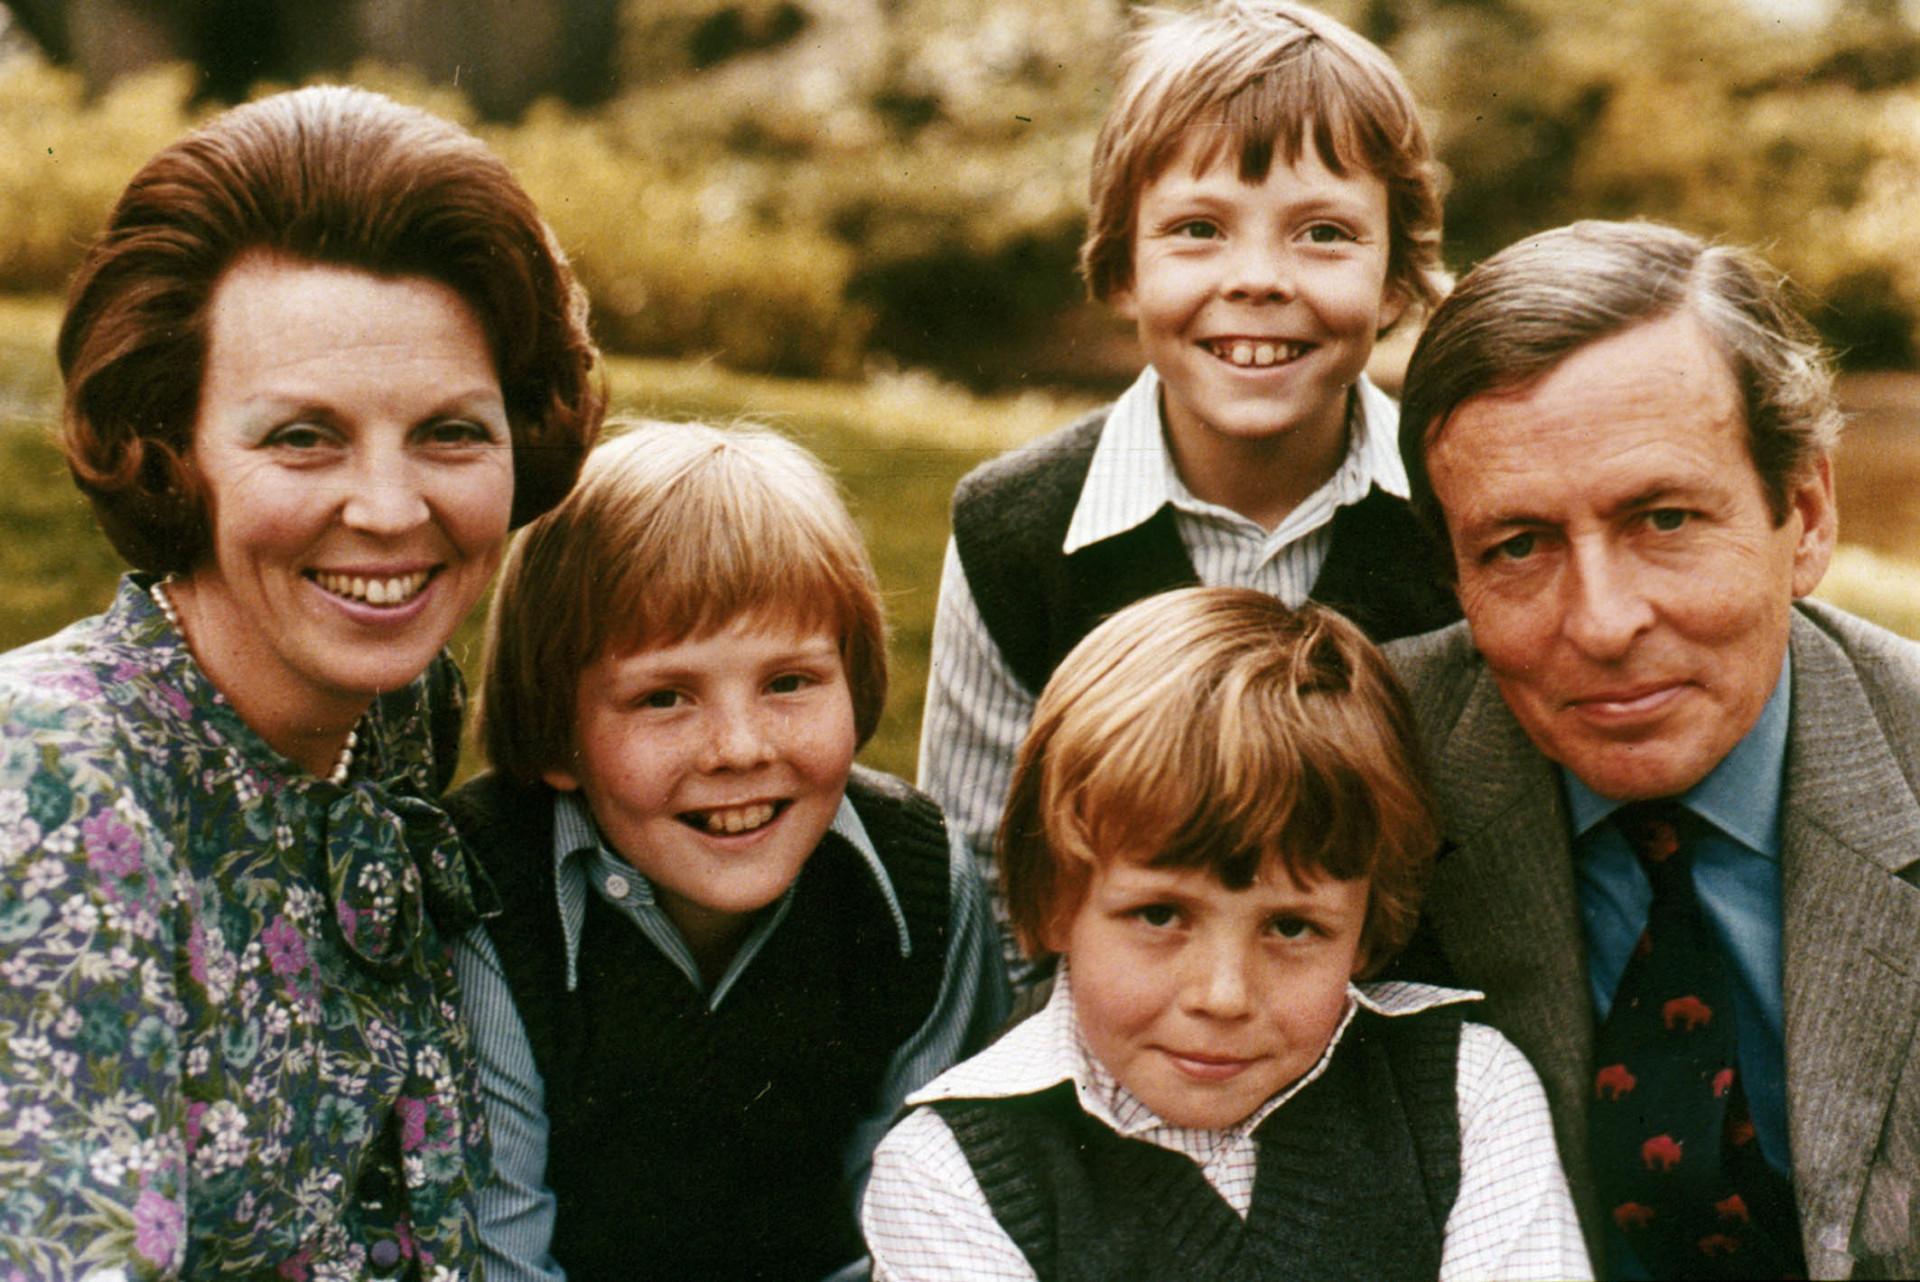 'Liefde' op de troon: prinses Juliana en prins Bernhard